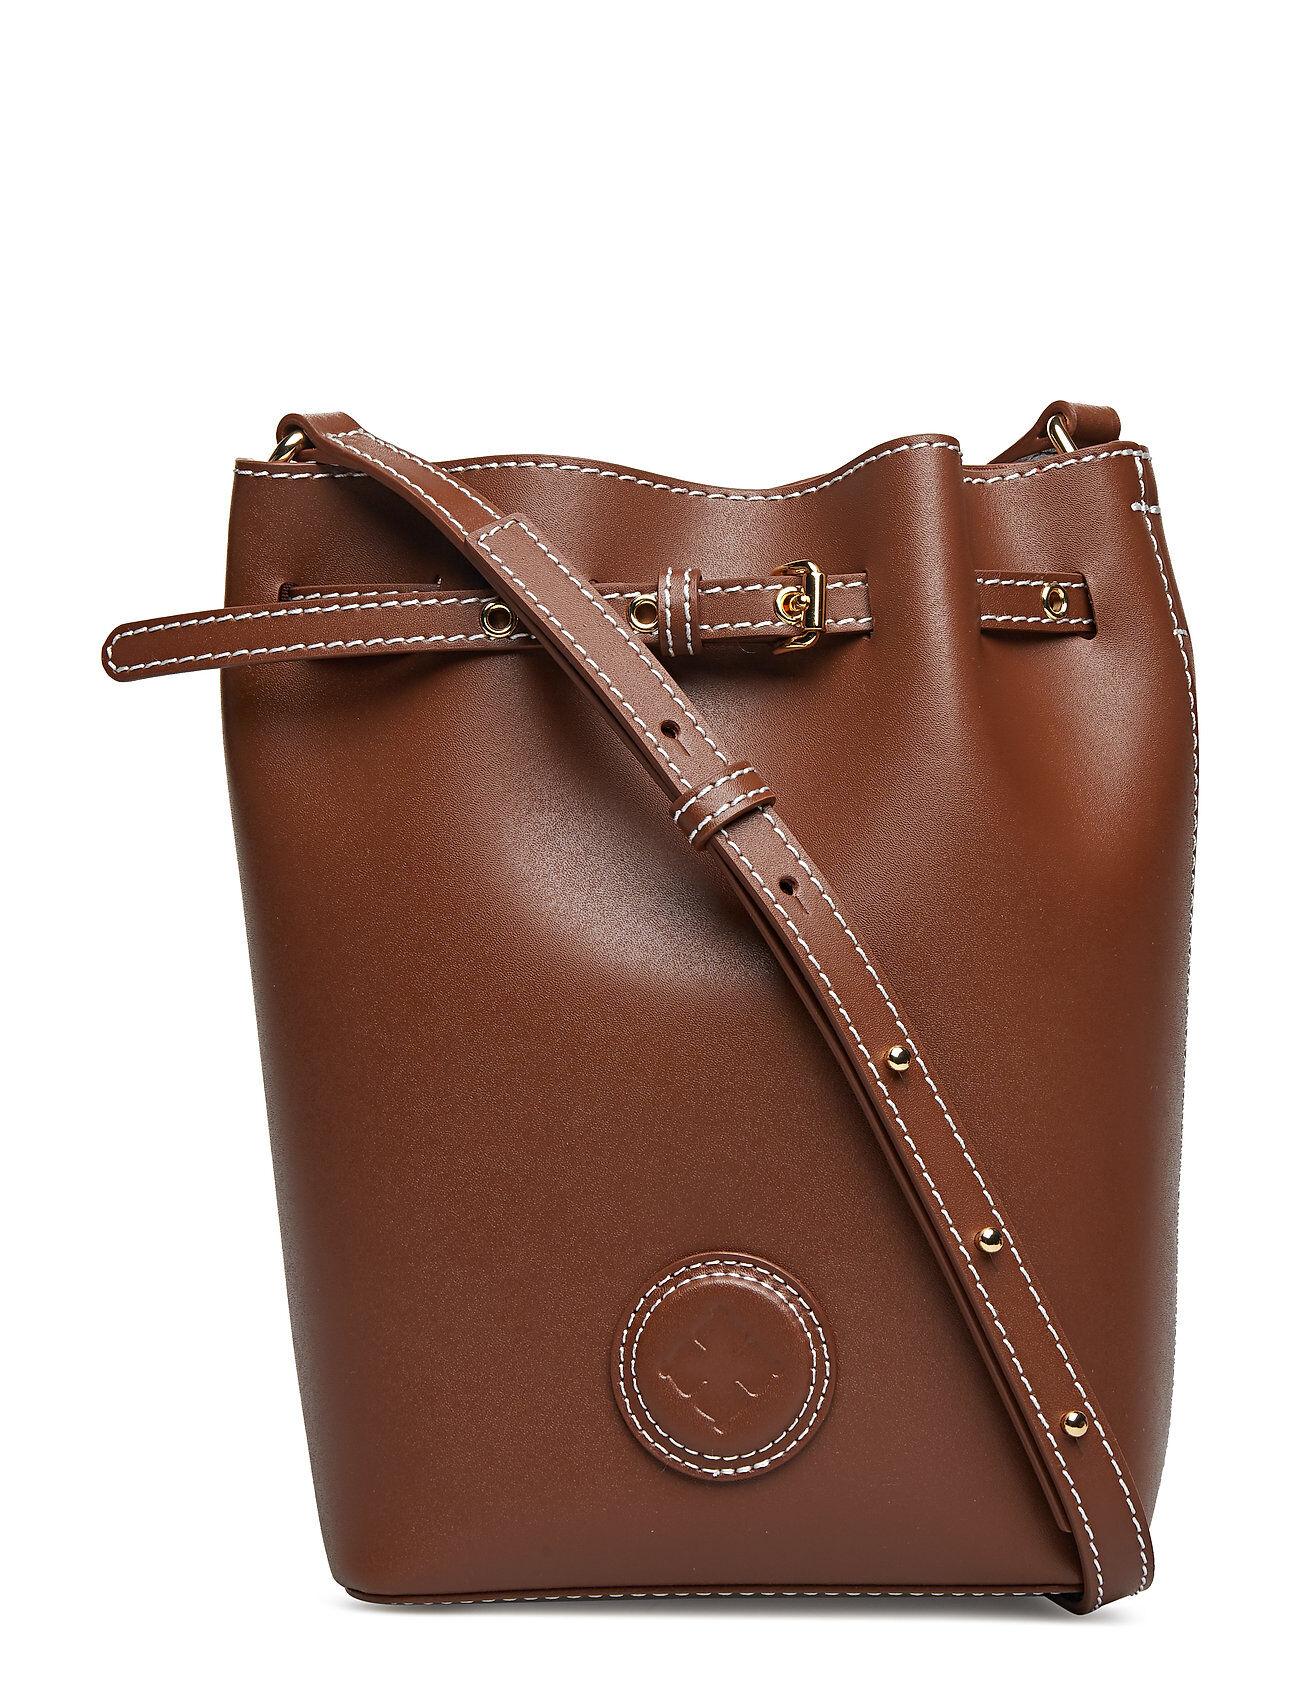 BY MALENE BIRGER Ema Mini Bags Bucket Bag Ruskea BY MALENE BIRGER